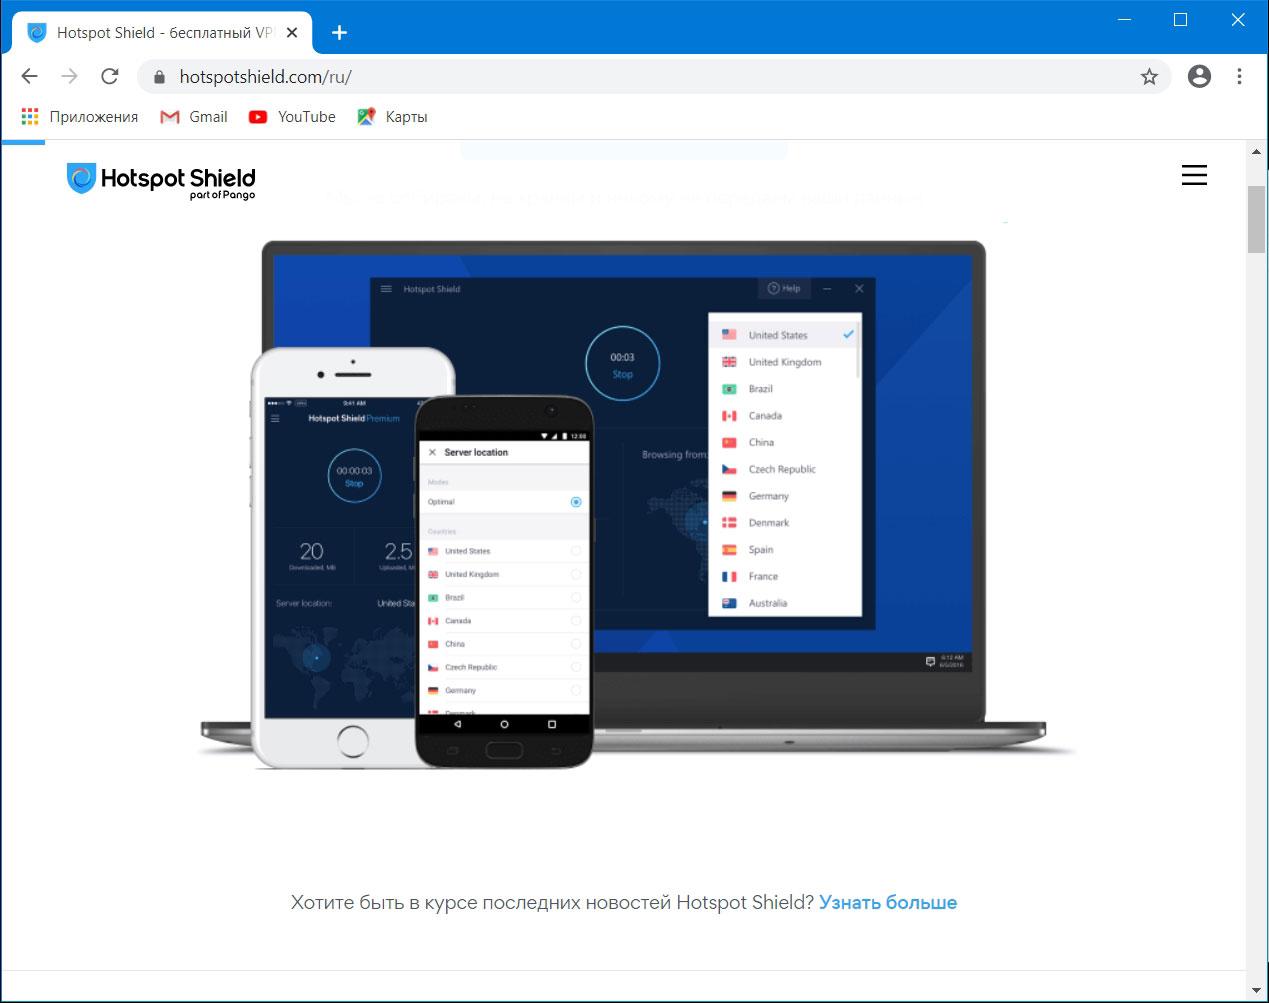 VPN-сервис Hotspot Shield для обхода блокировки сайта рума Titan poker.